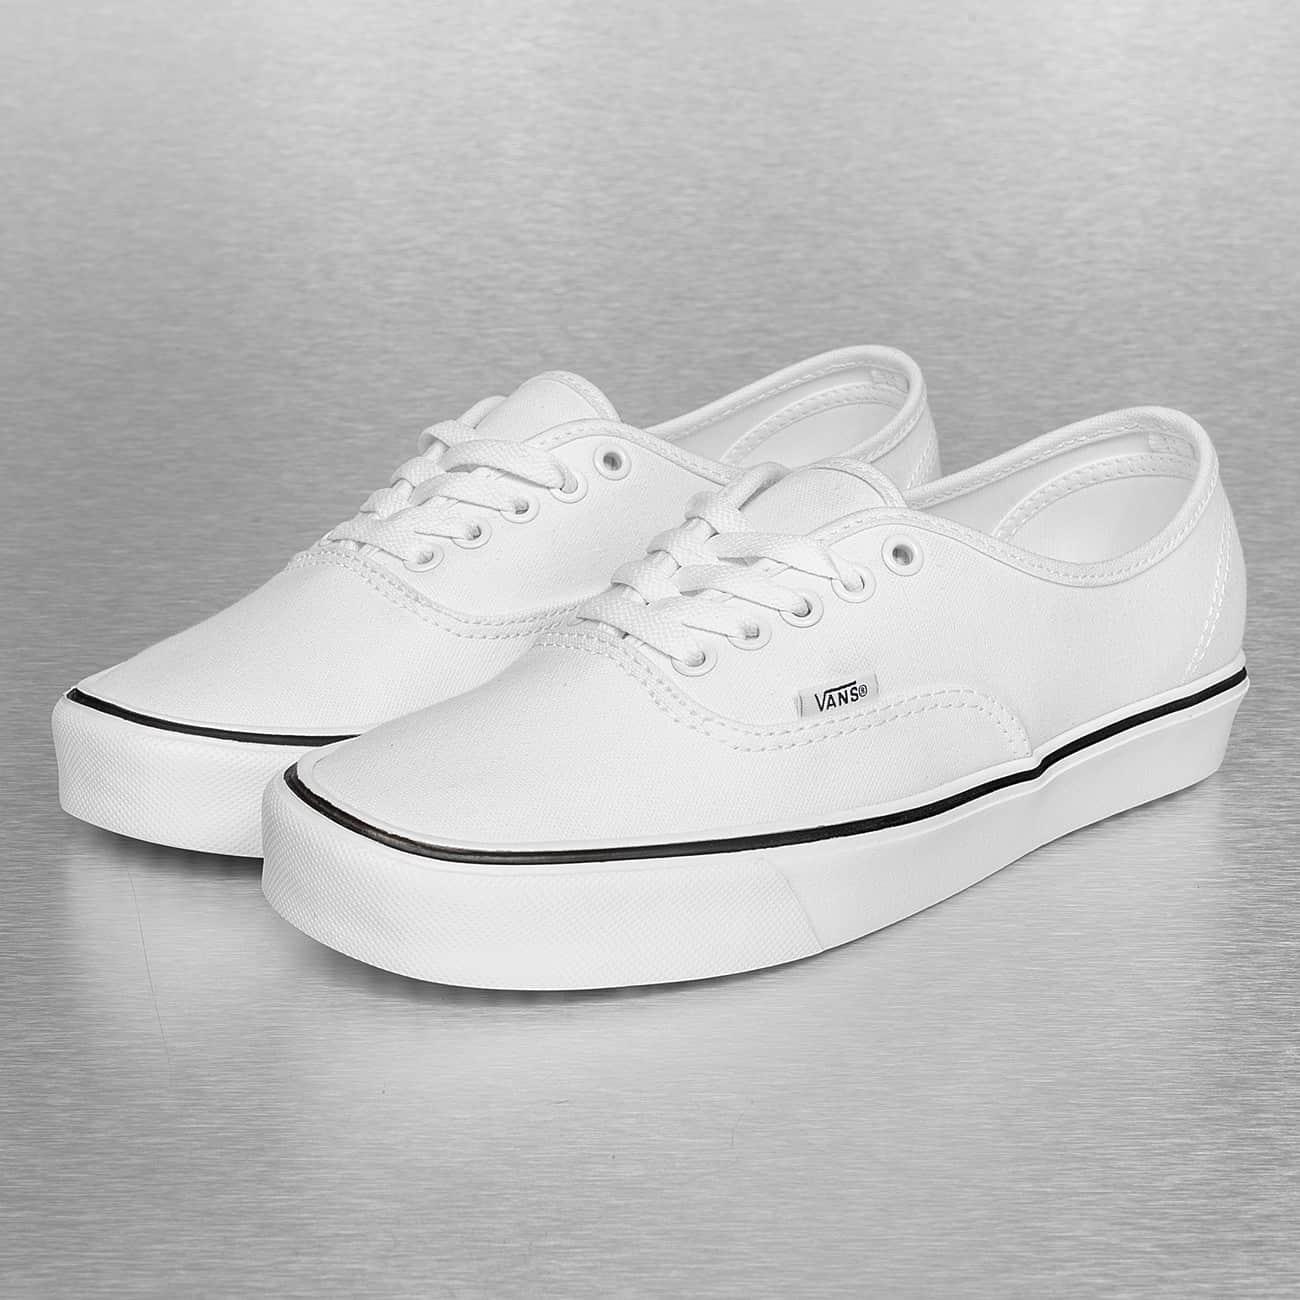 Sneaker usa online shop